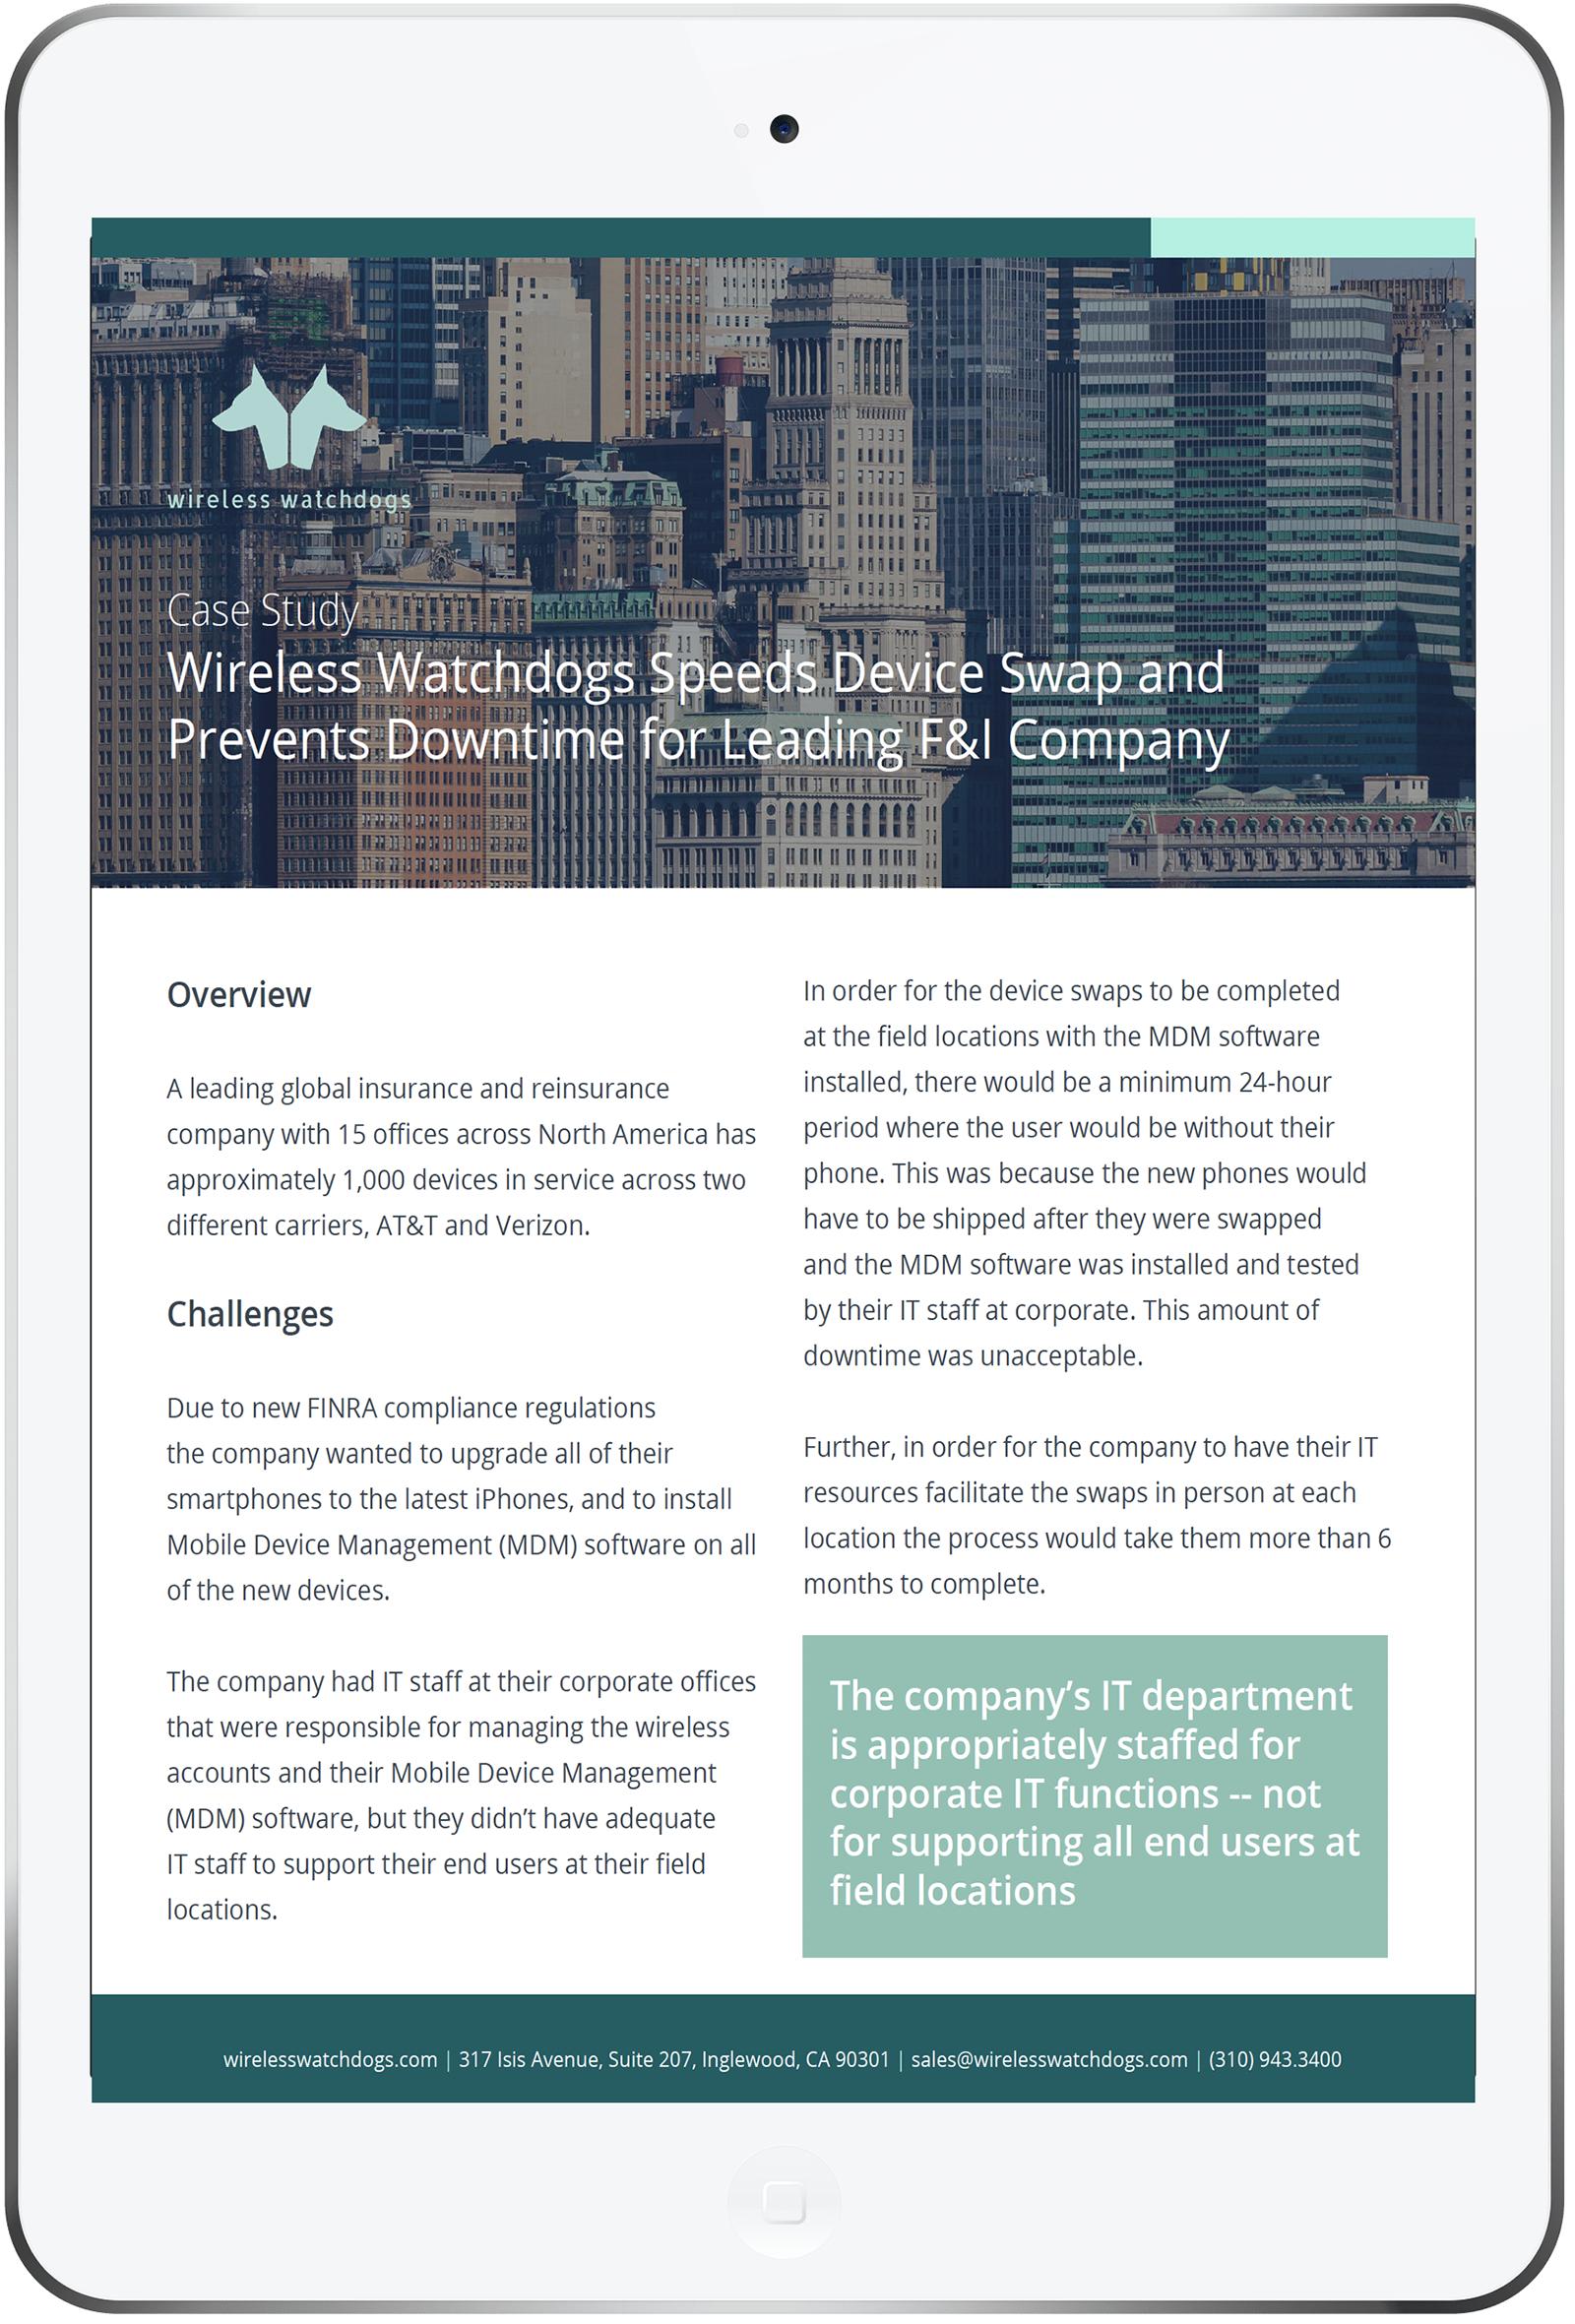 WW_iPad_FinTech_Case_Study-tsp-mockup